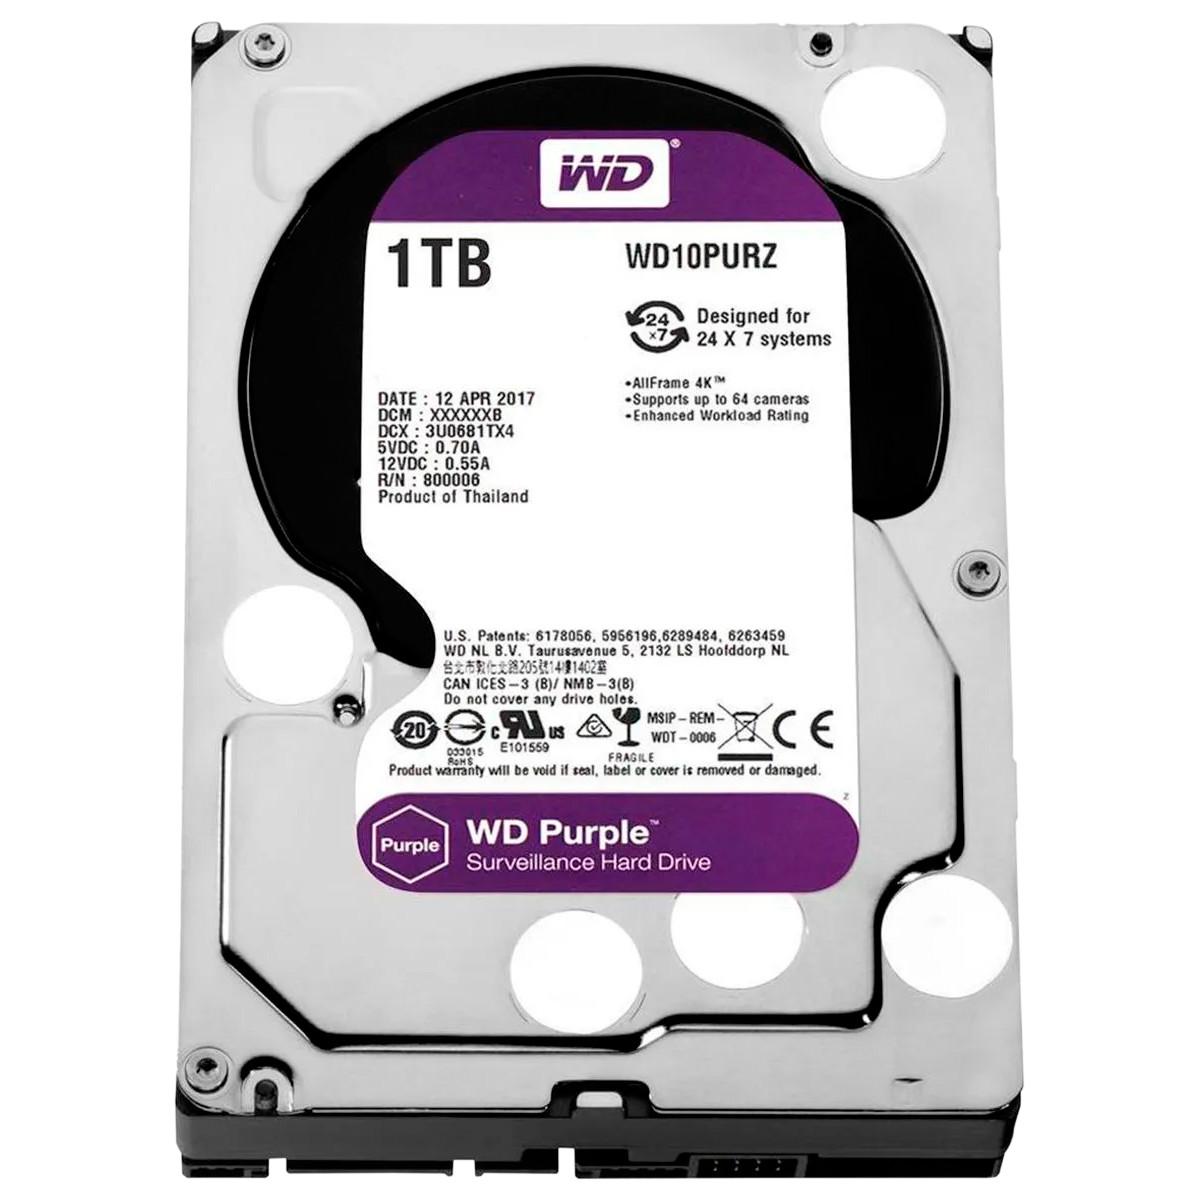 kit-2-cameras-externas-wi-fi-mibo-full-hd-1080p-im5-intelbras-1-nvr-stand-alone-04-canais-6mp-nvd-1304-intelbras-1-hd-interno-wd-purple-1tb-surveillance-sata-iii-03